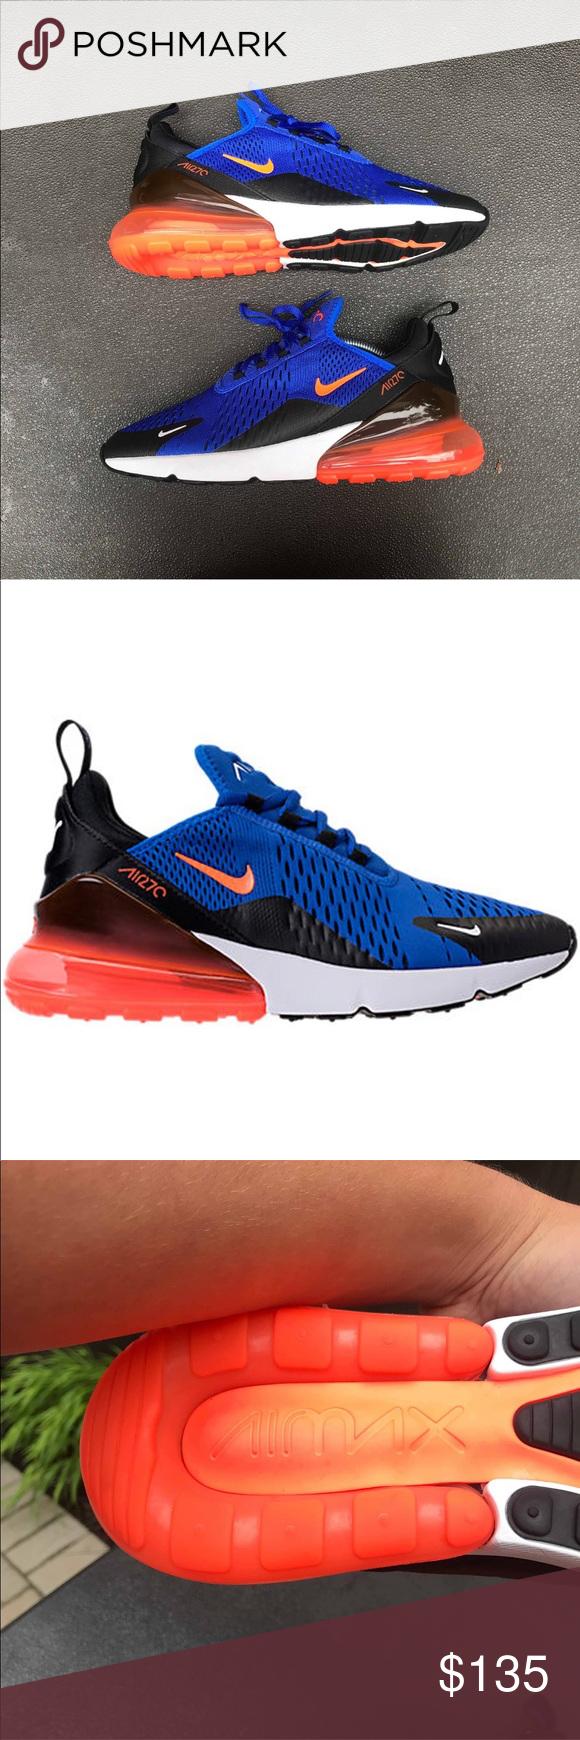 Nike airmax 270 racer blueorange Brand new never worn comes